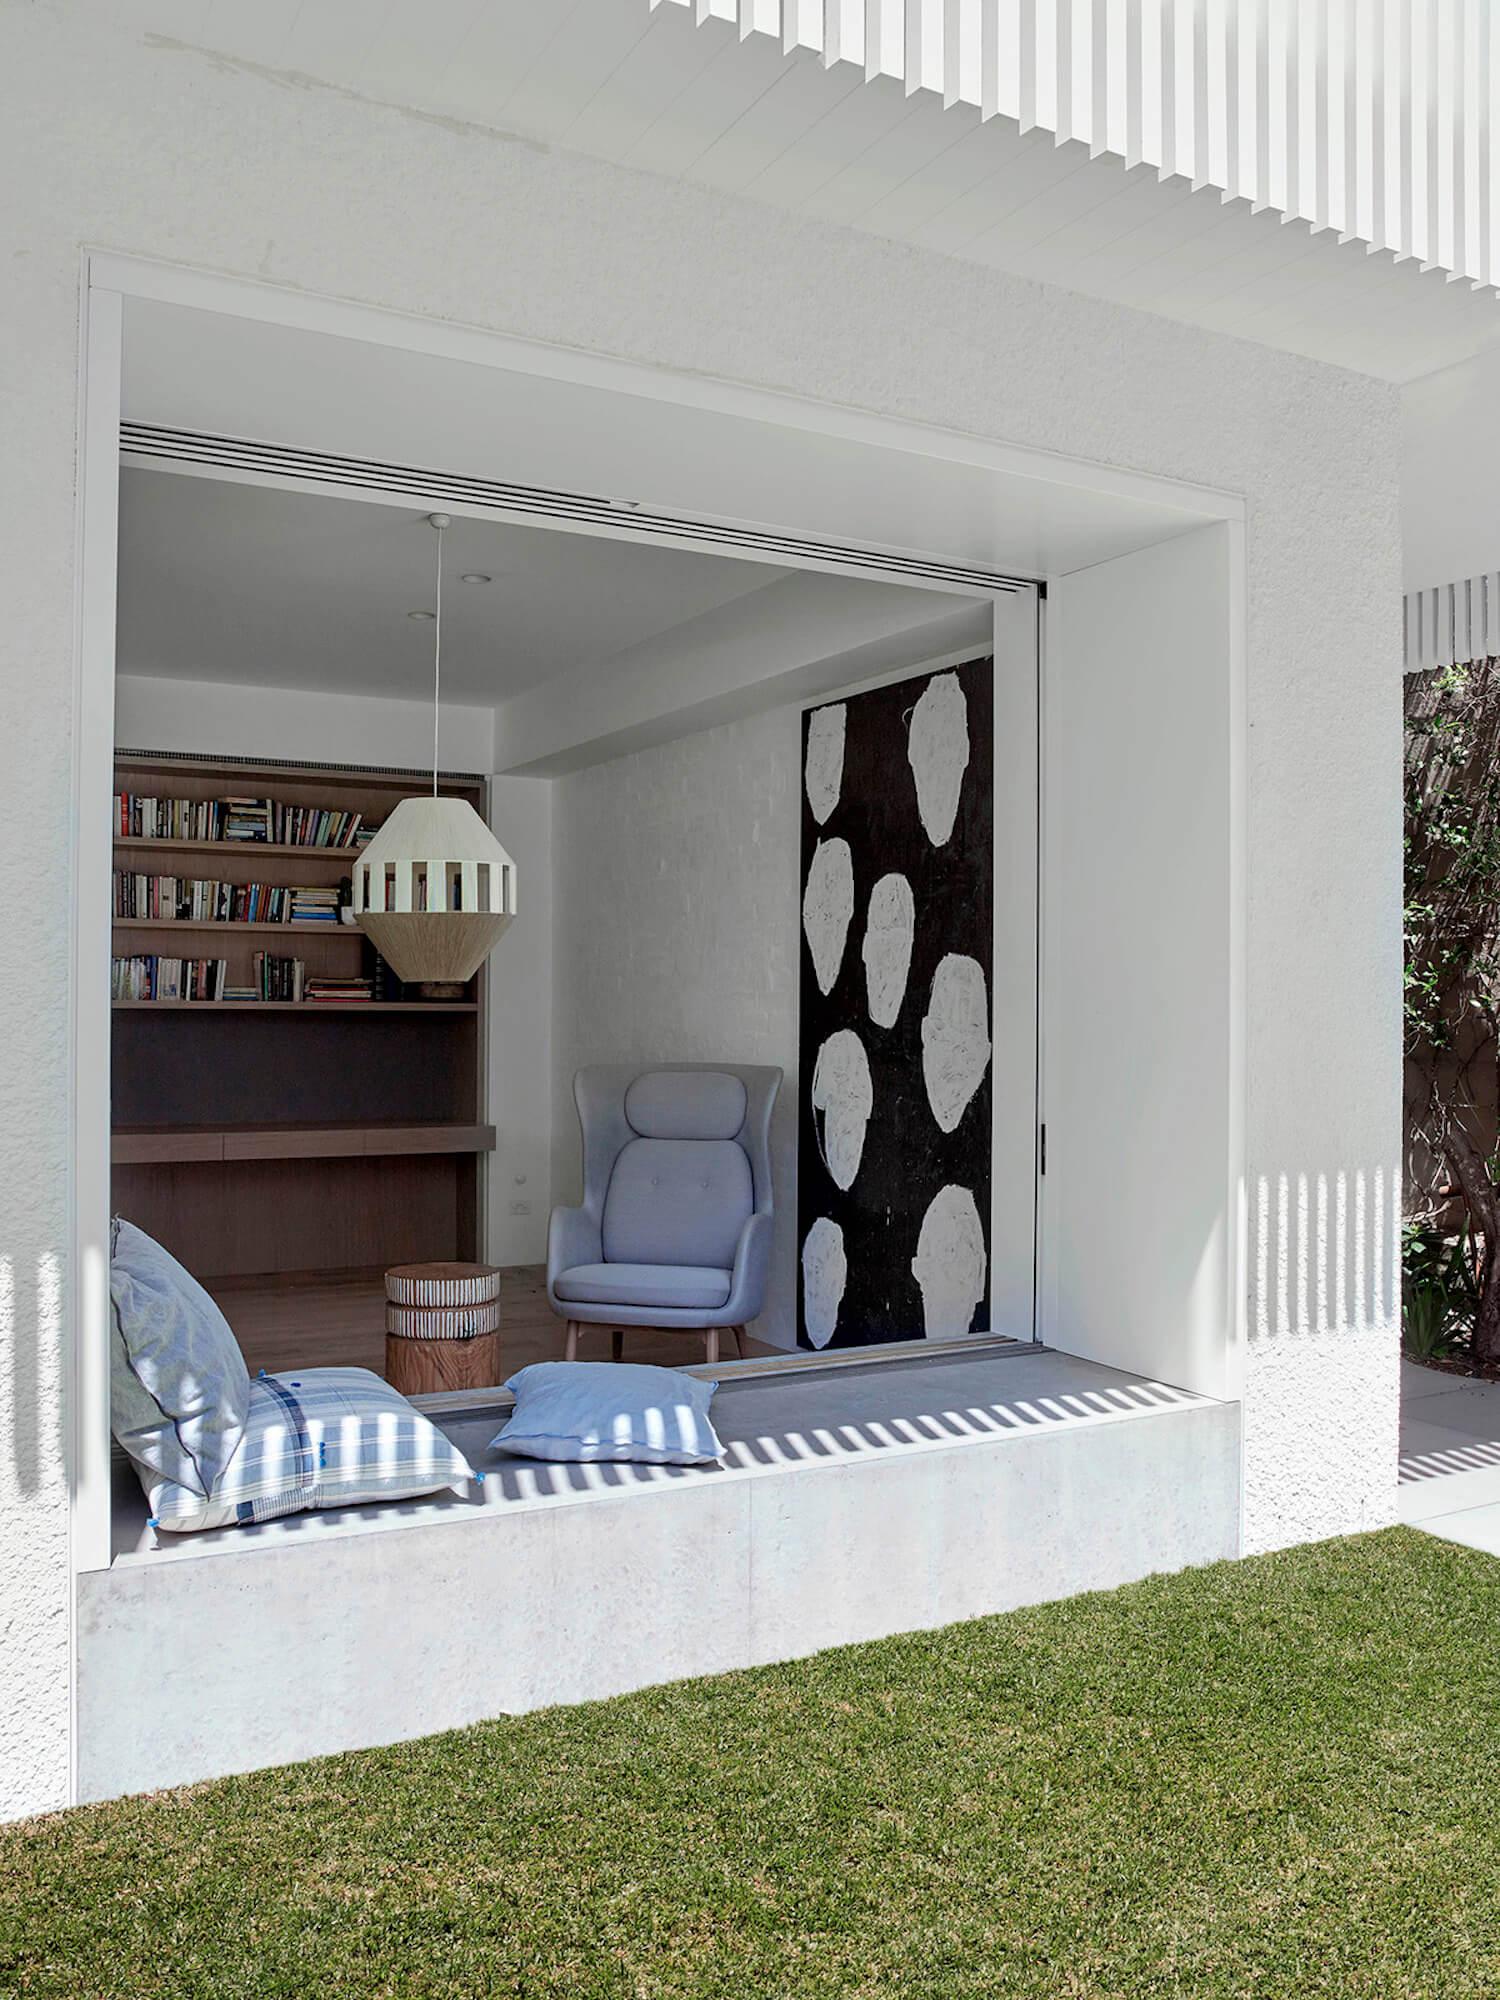 est living clovelly house II madeleine blanchfield architects 12